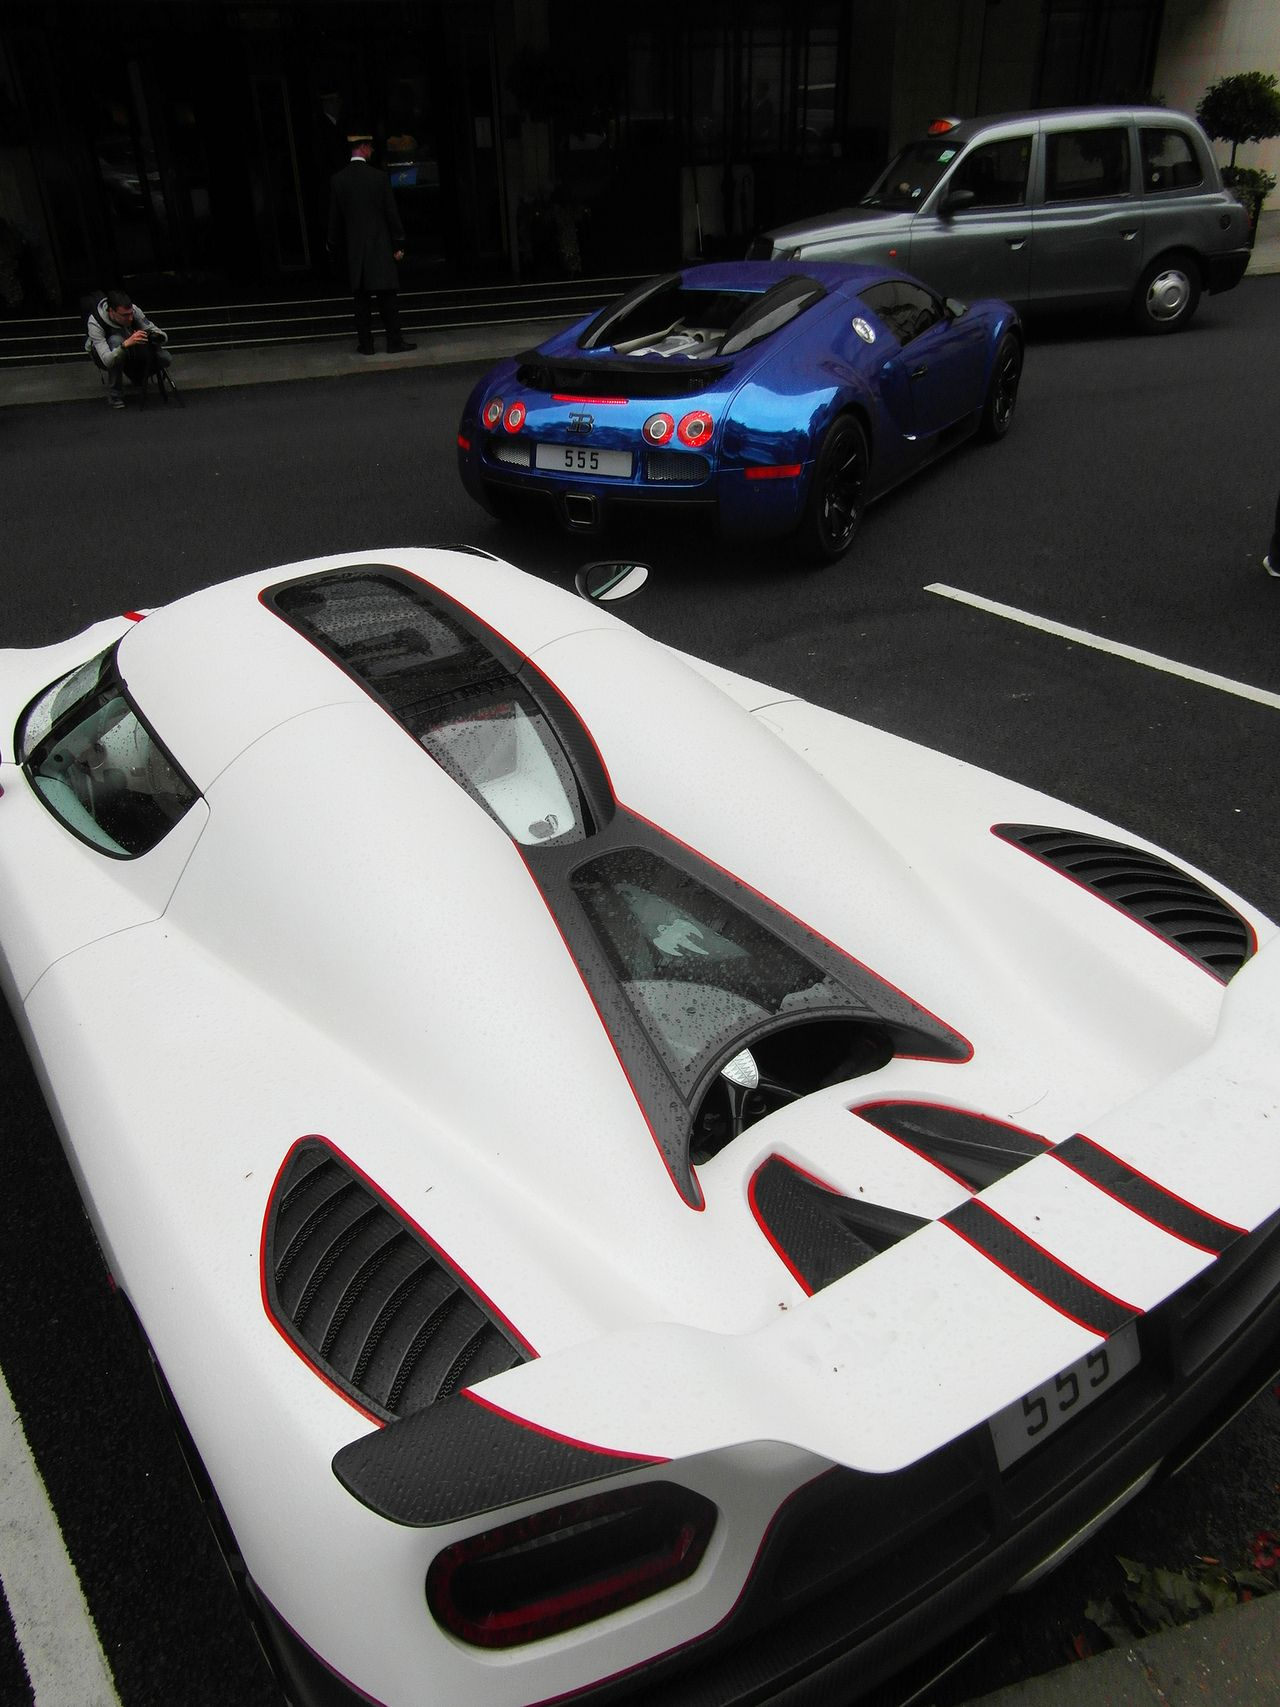 That Car Is Hawt Koenigsegg Super Cars Sport Cars